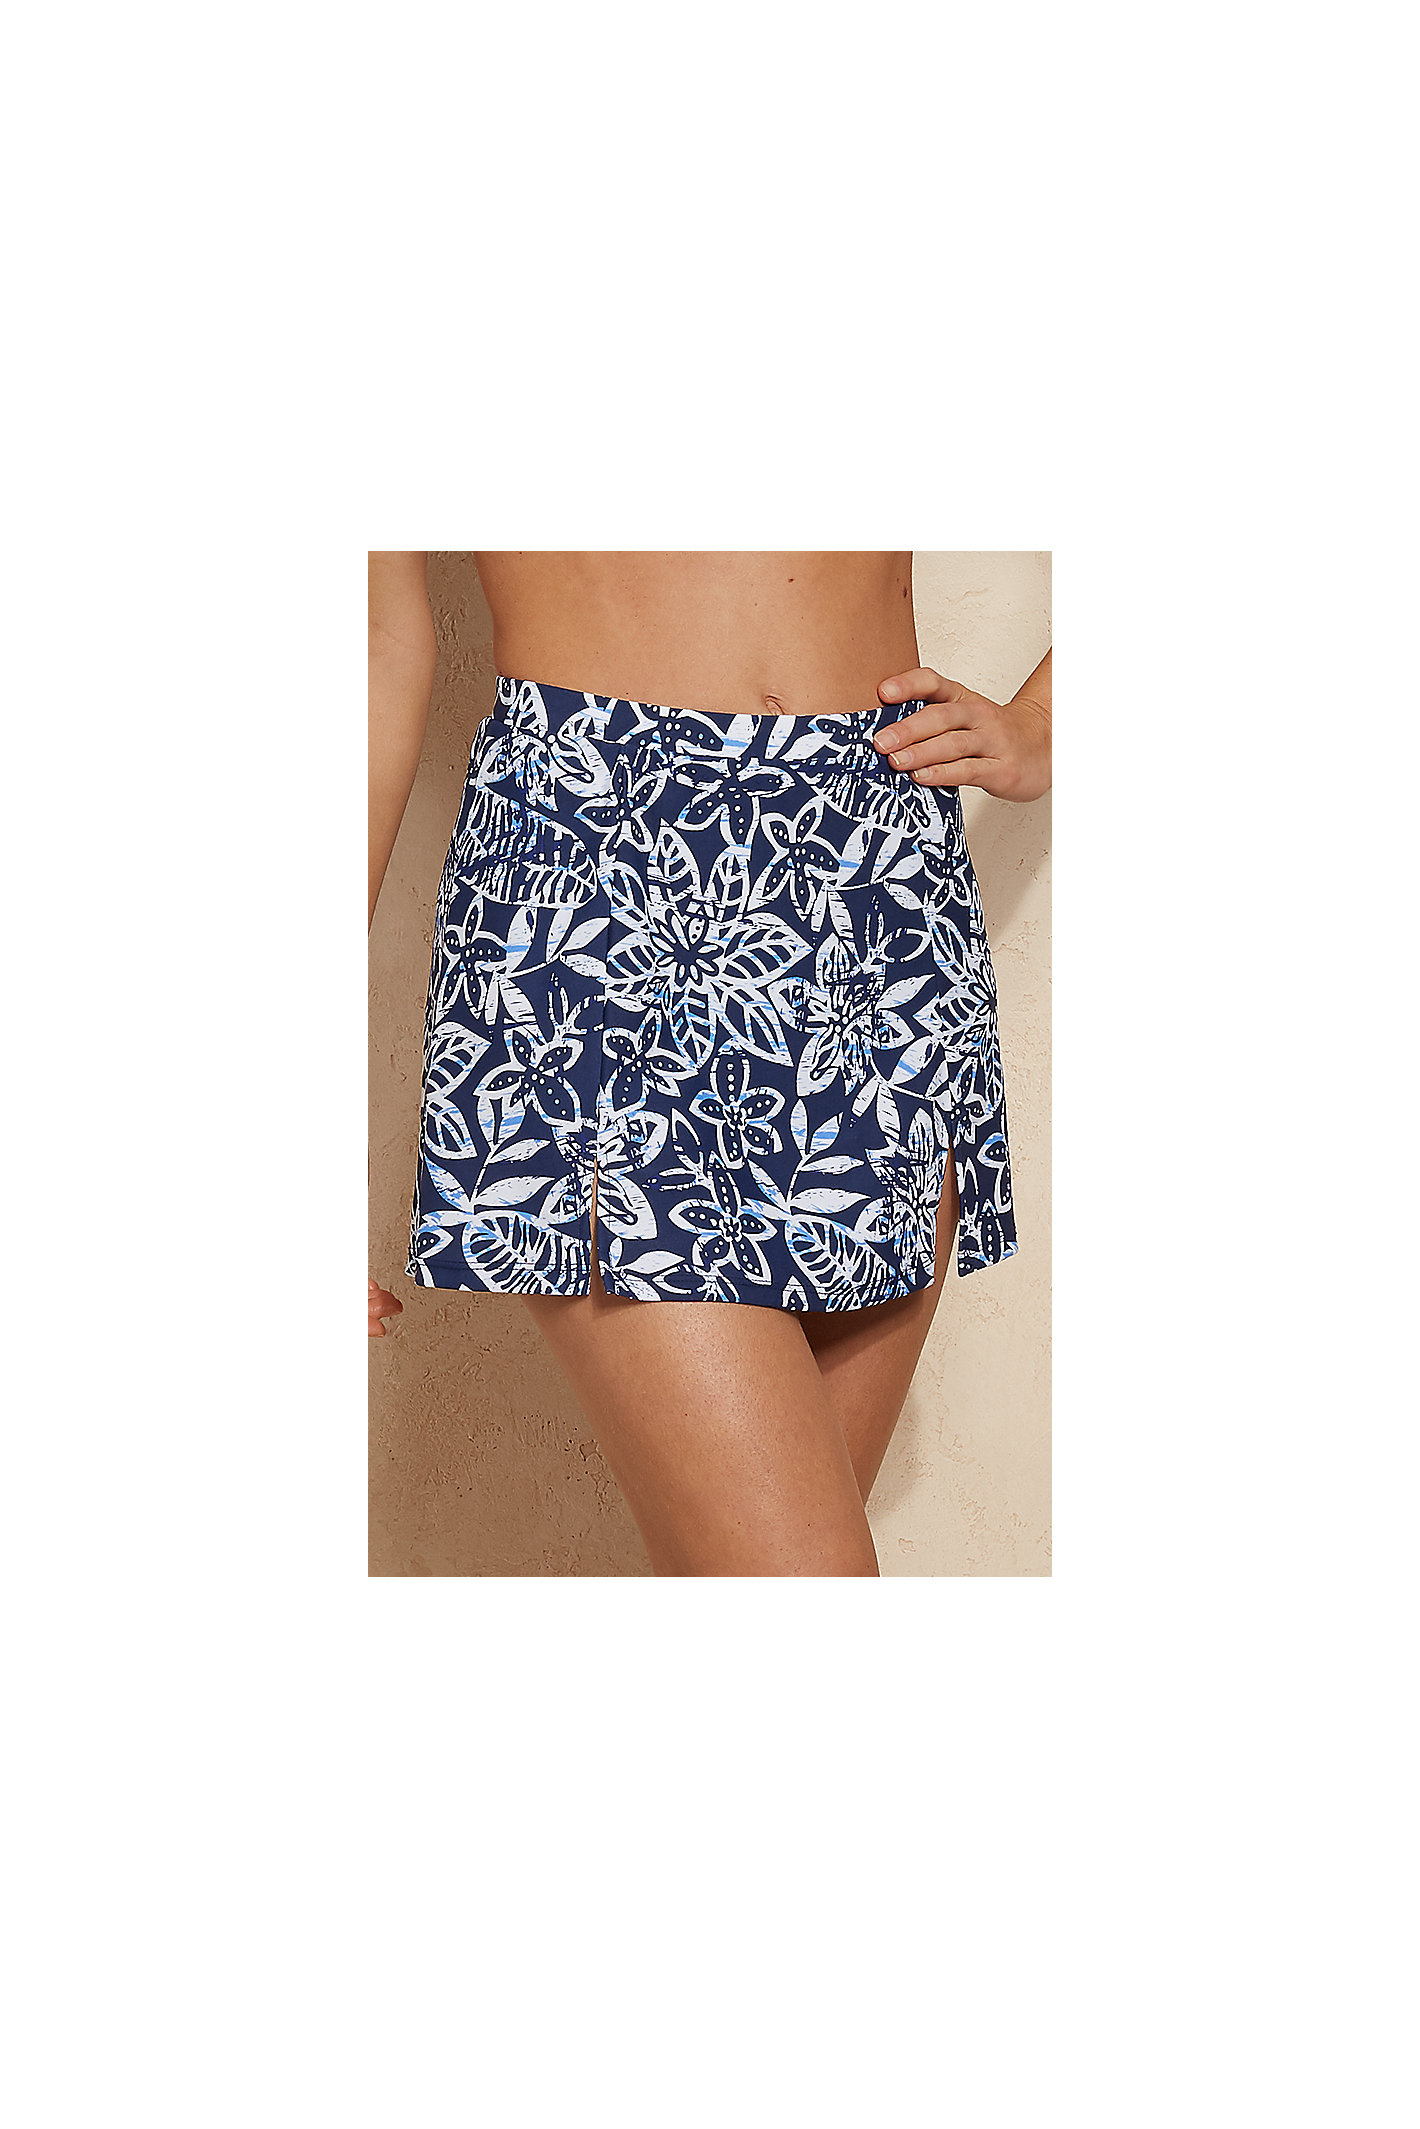 Carol Wior Batik Skirt